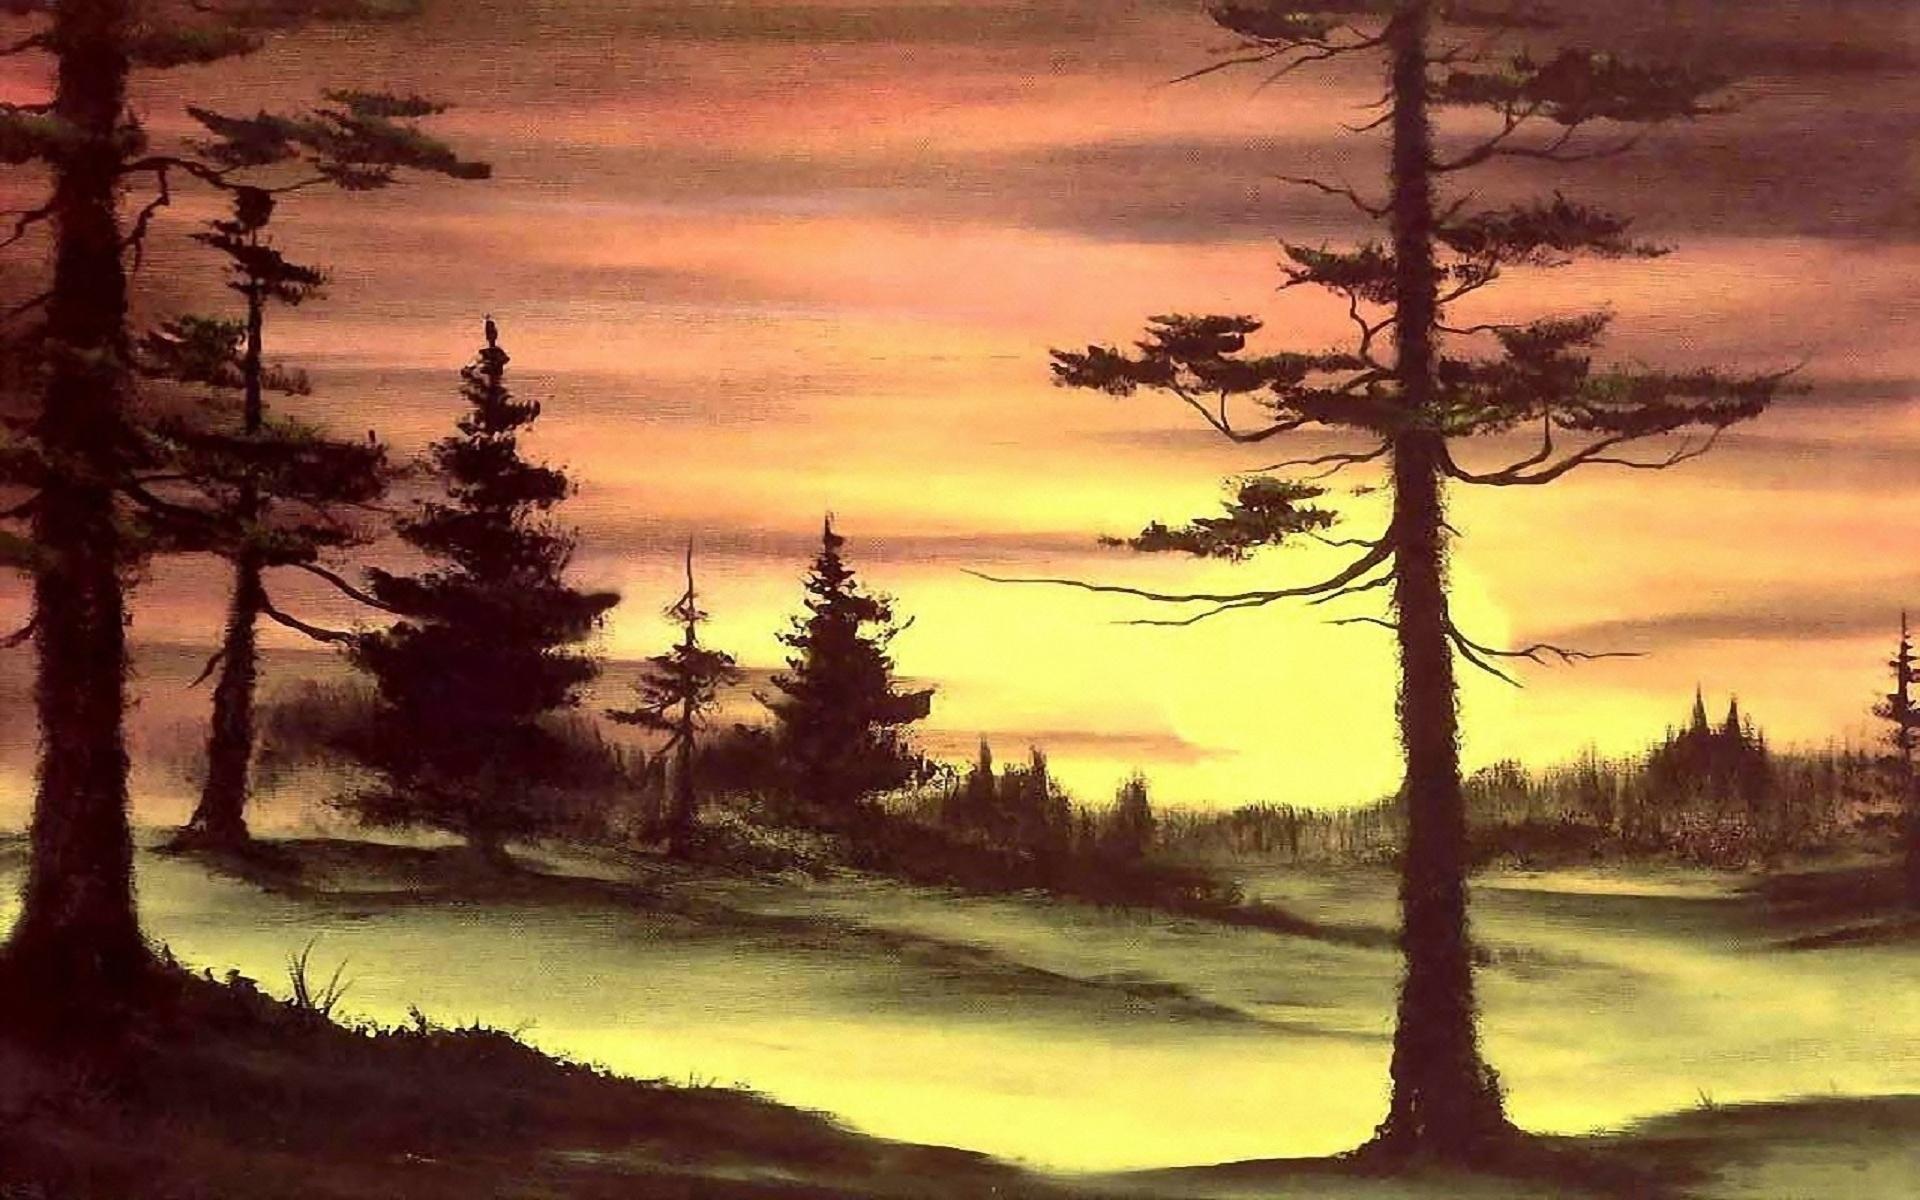 the bob ross painting method essay